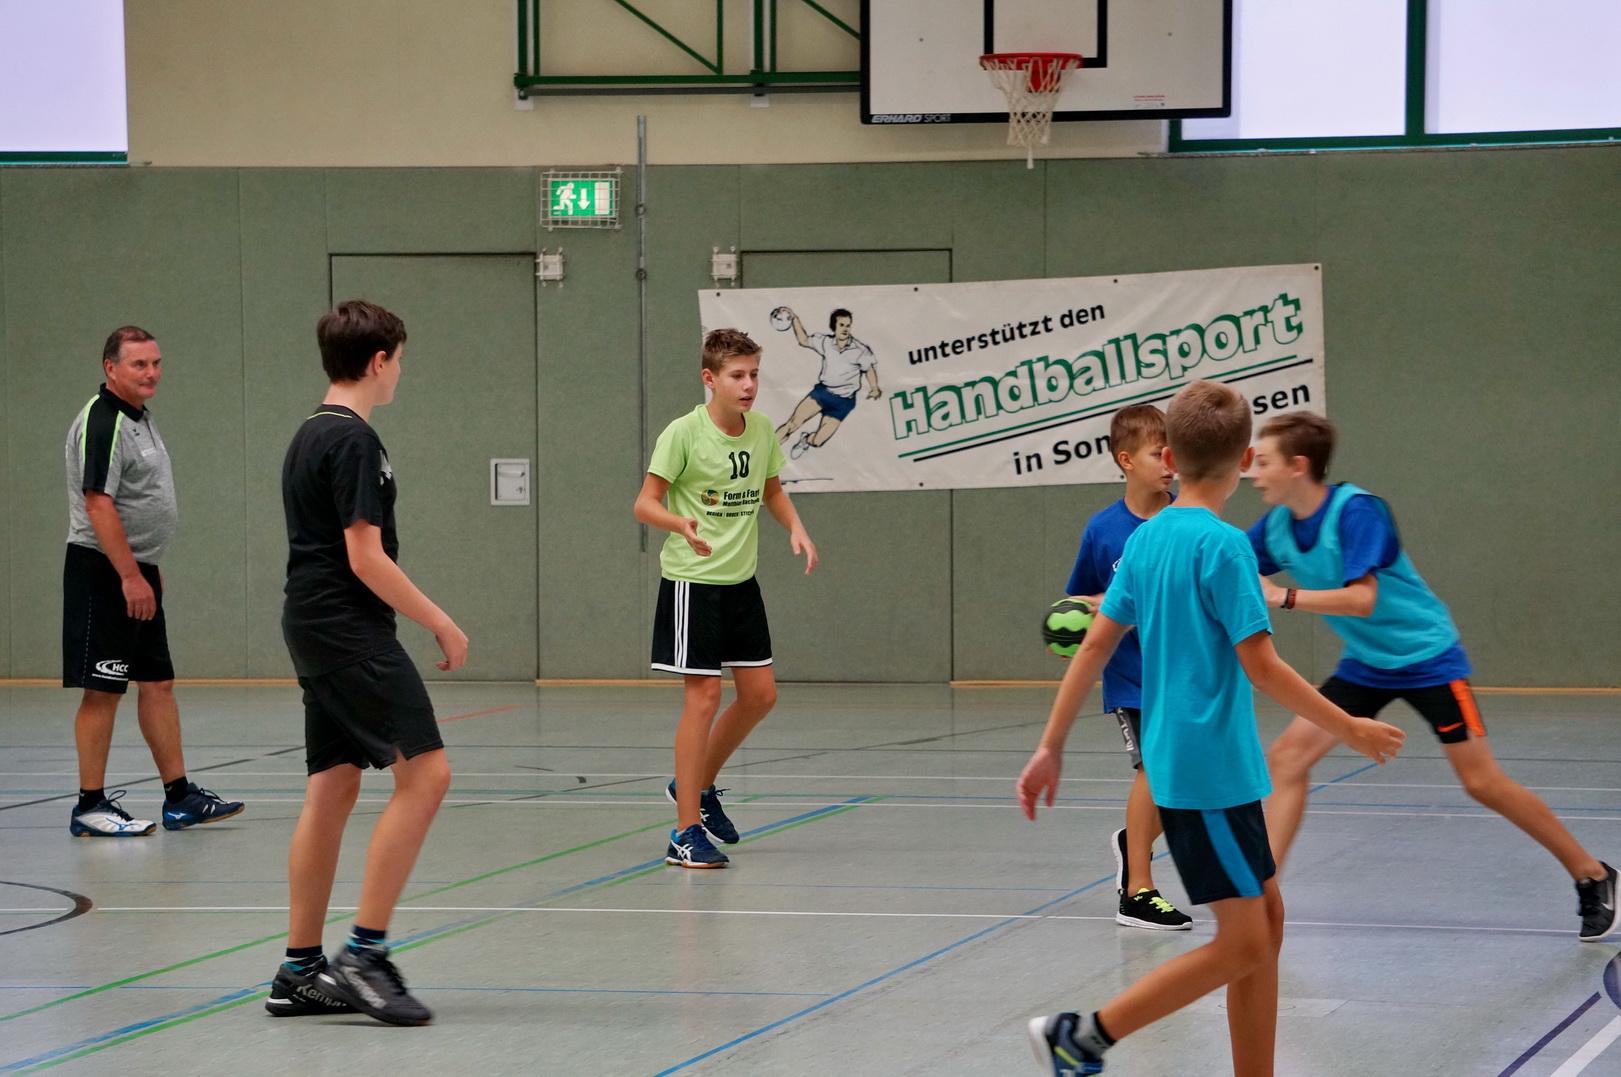 201808_Handballcamp_SDH_MG_109w